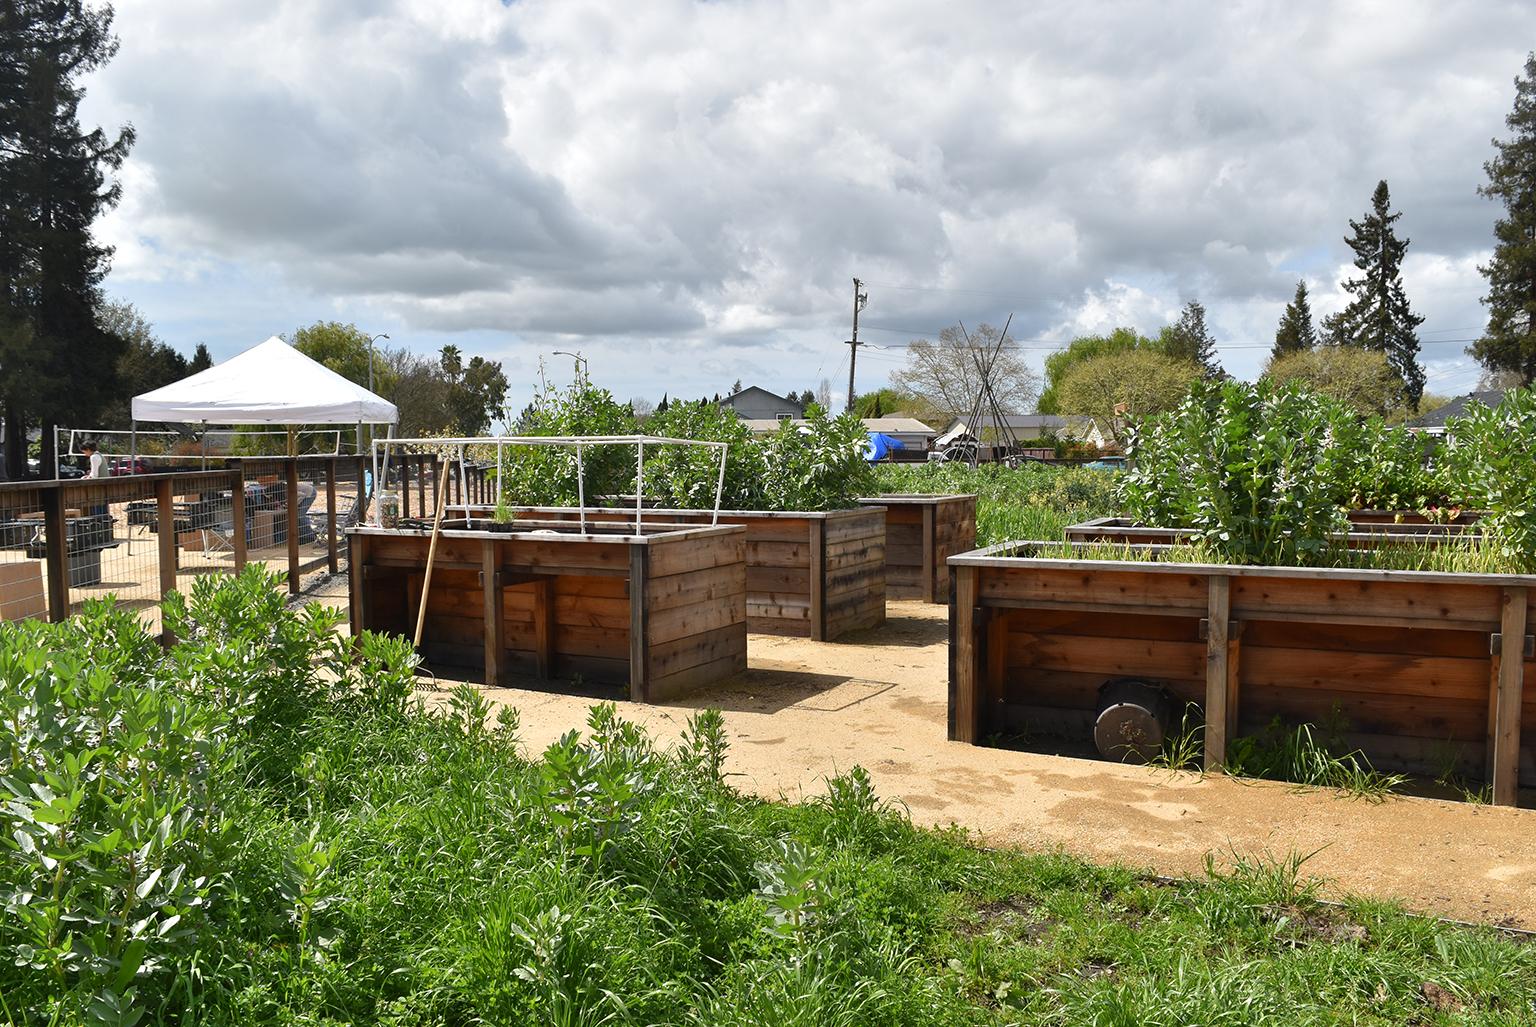 Bayer Park and Garden